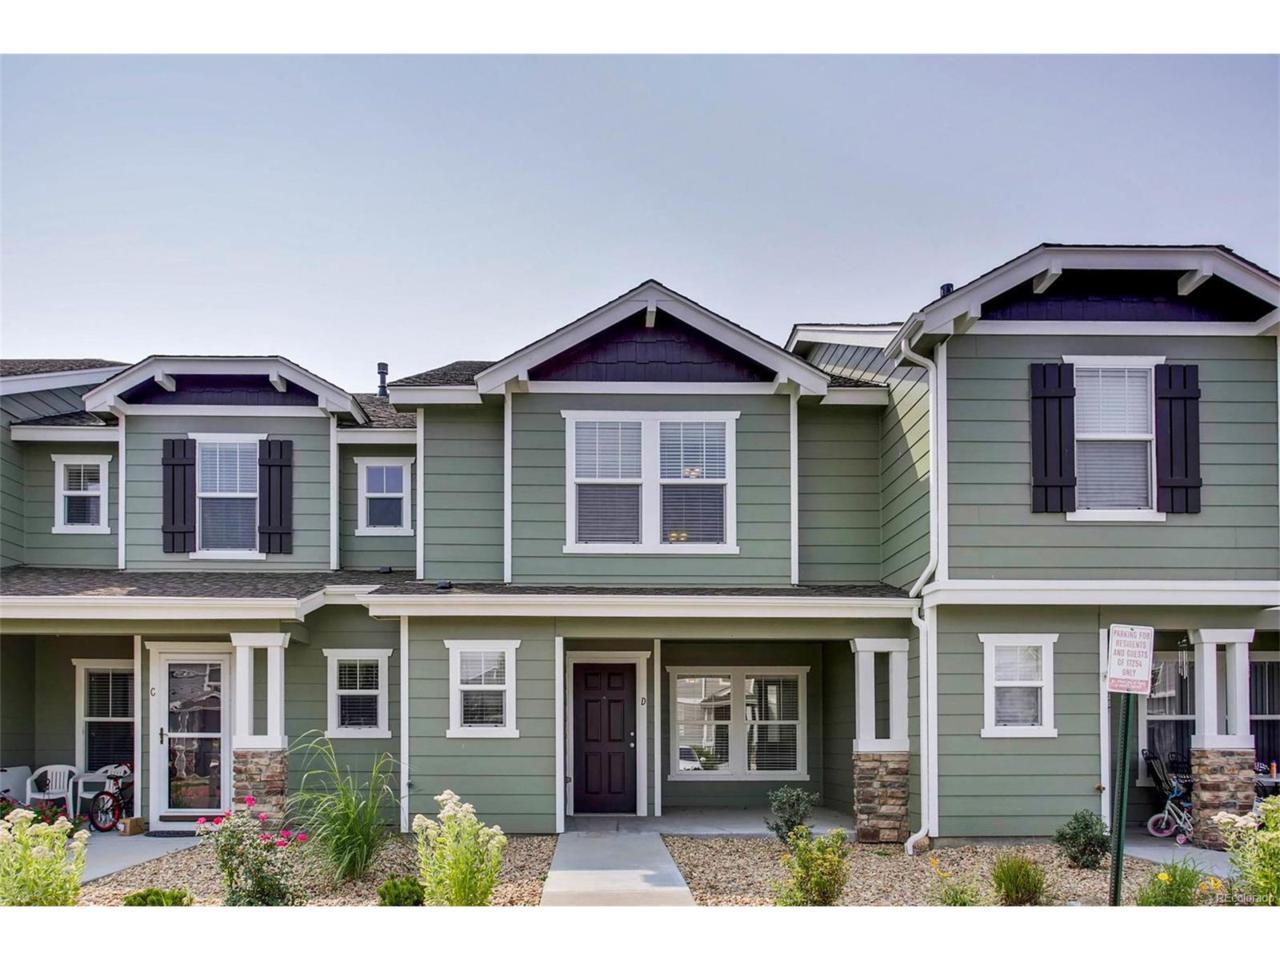 17254 Lark Water Lane D, Parker, CO 80134 (MLS #3133668) :: 8z Real Estate